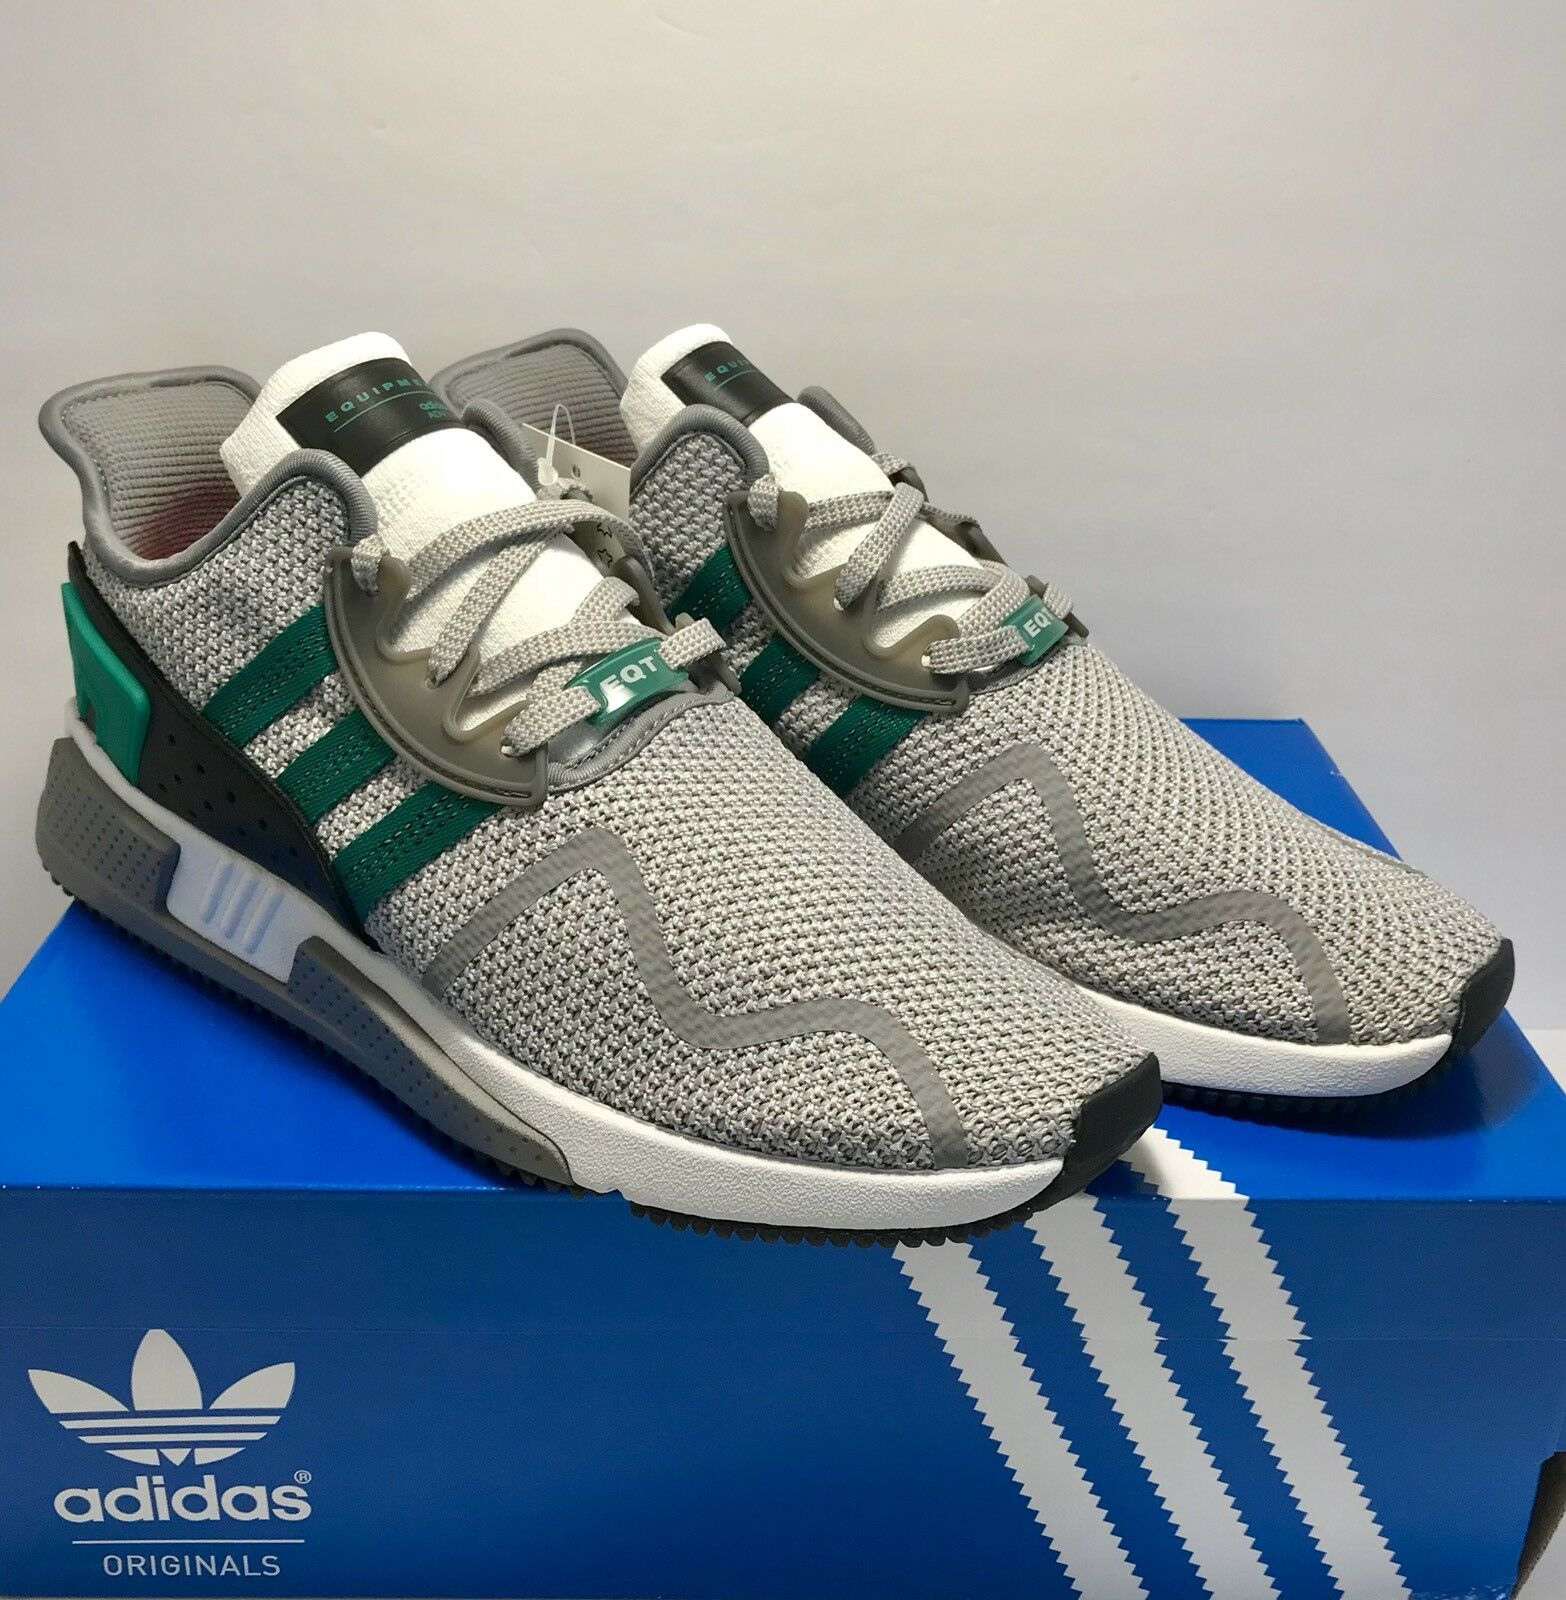 Adidas Originals Mens Size 12 EQT Cushion ADV Grey Grey Grey Wolf Sub Green Black White 5e13ed